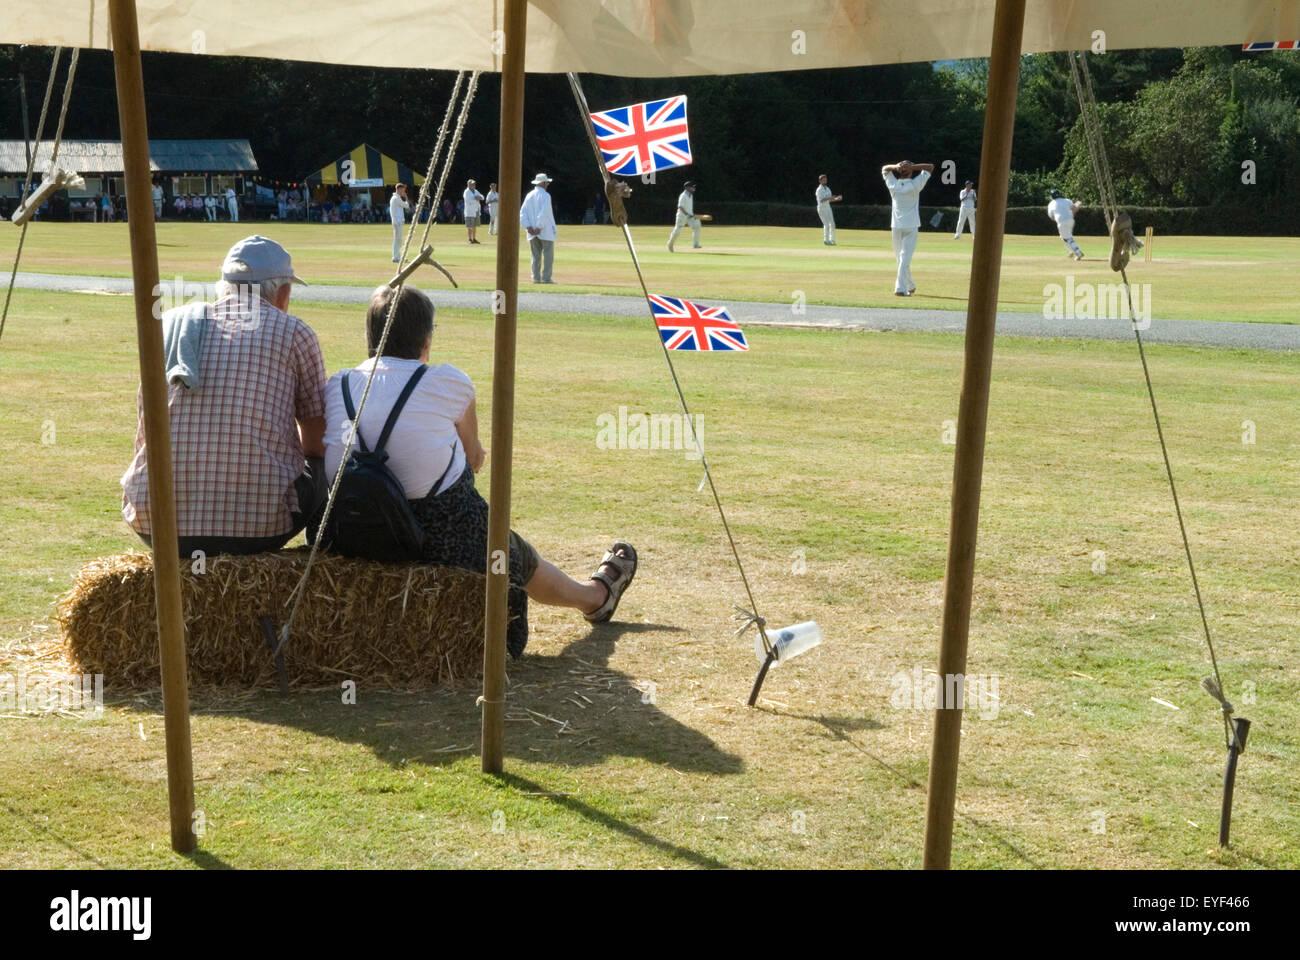 Ebernoe village Common. Annual cricket match on  Common, Ebernoe CC versus Wessrx Pilgrims CC. HOMER SYKES - Stock Image